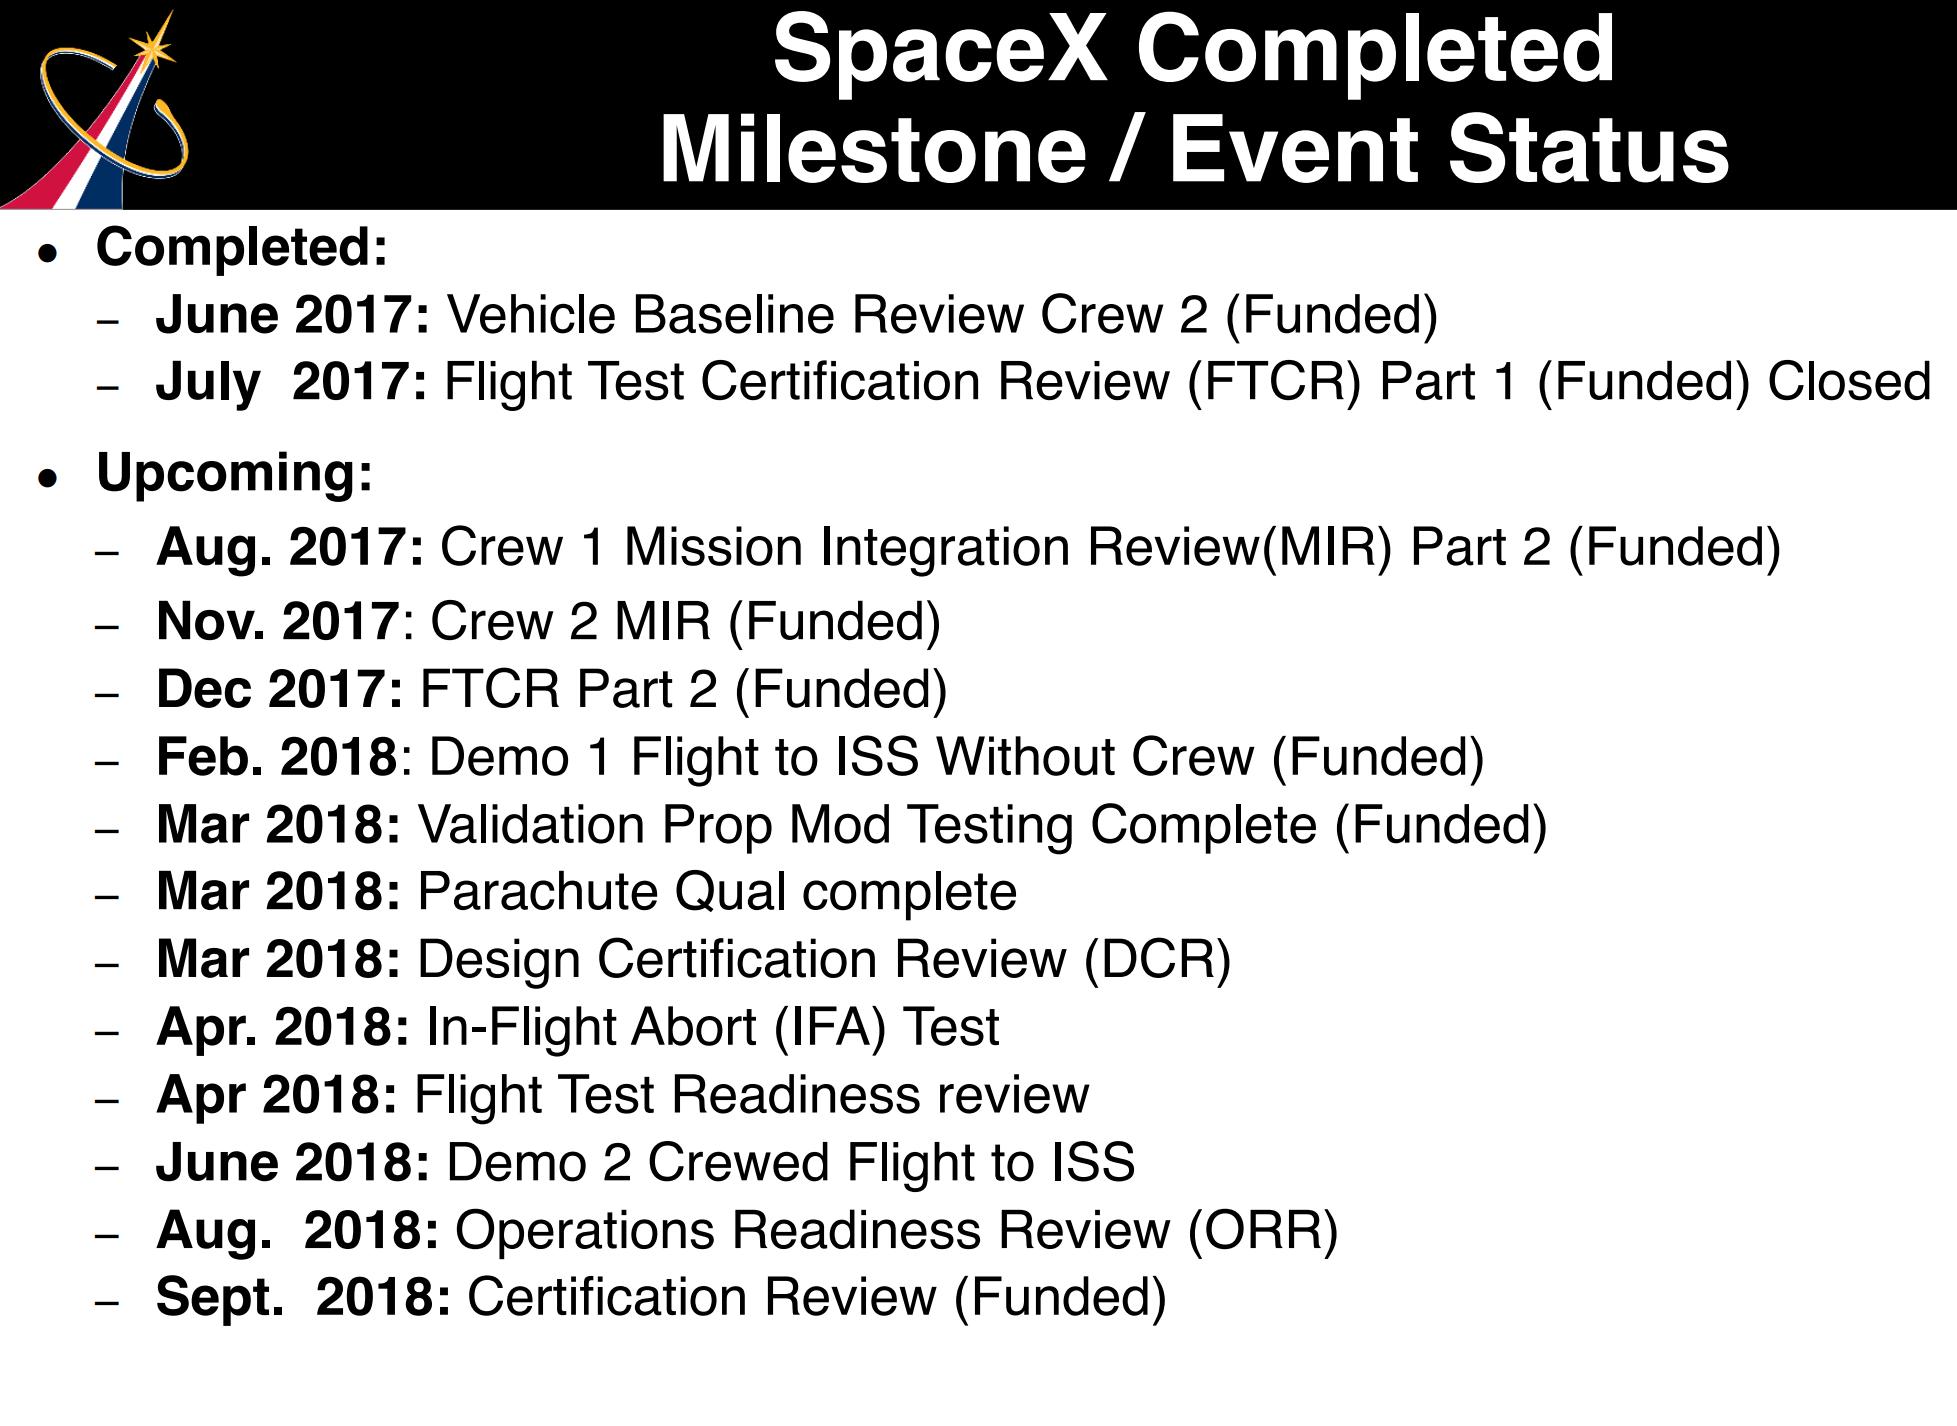 spacex ccp milestones